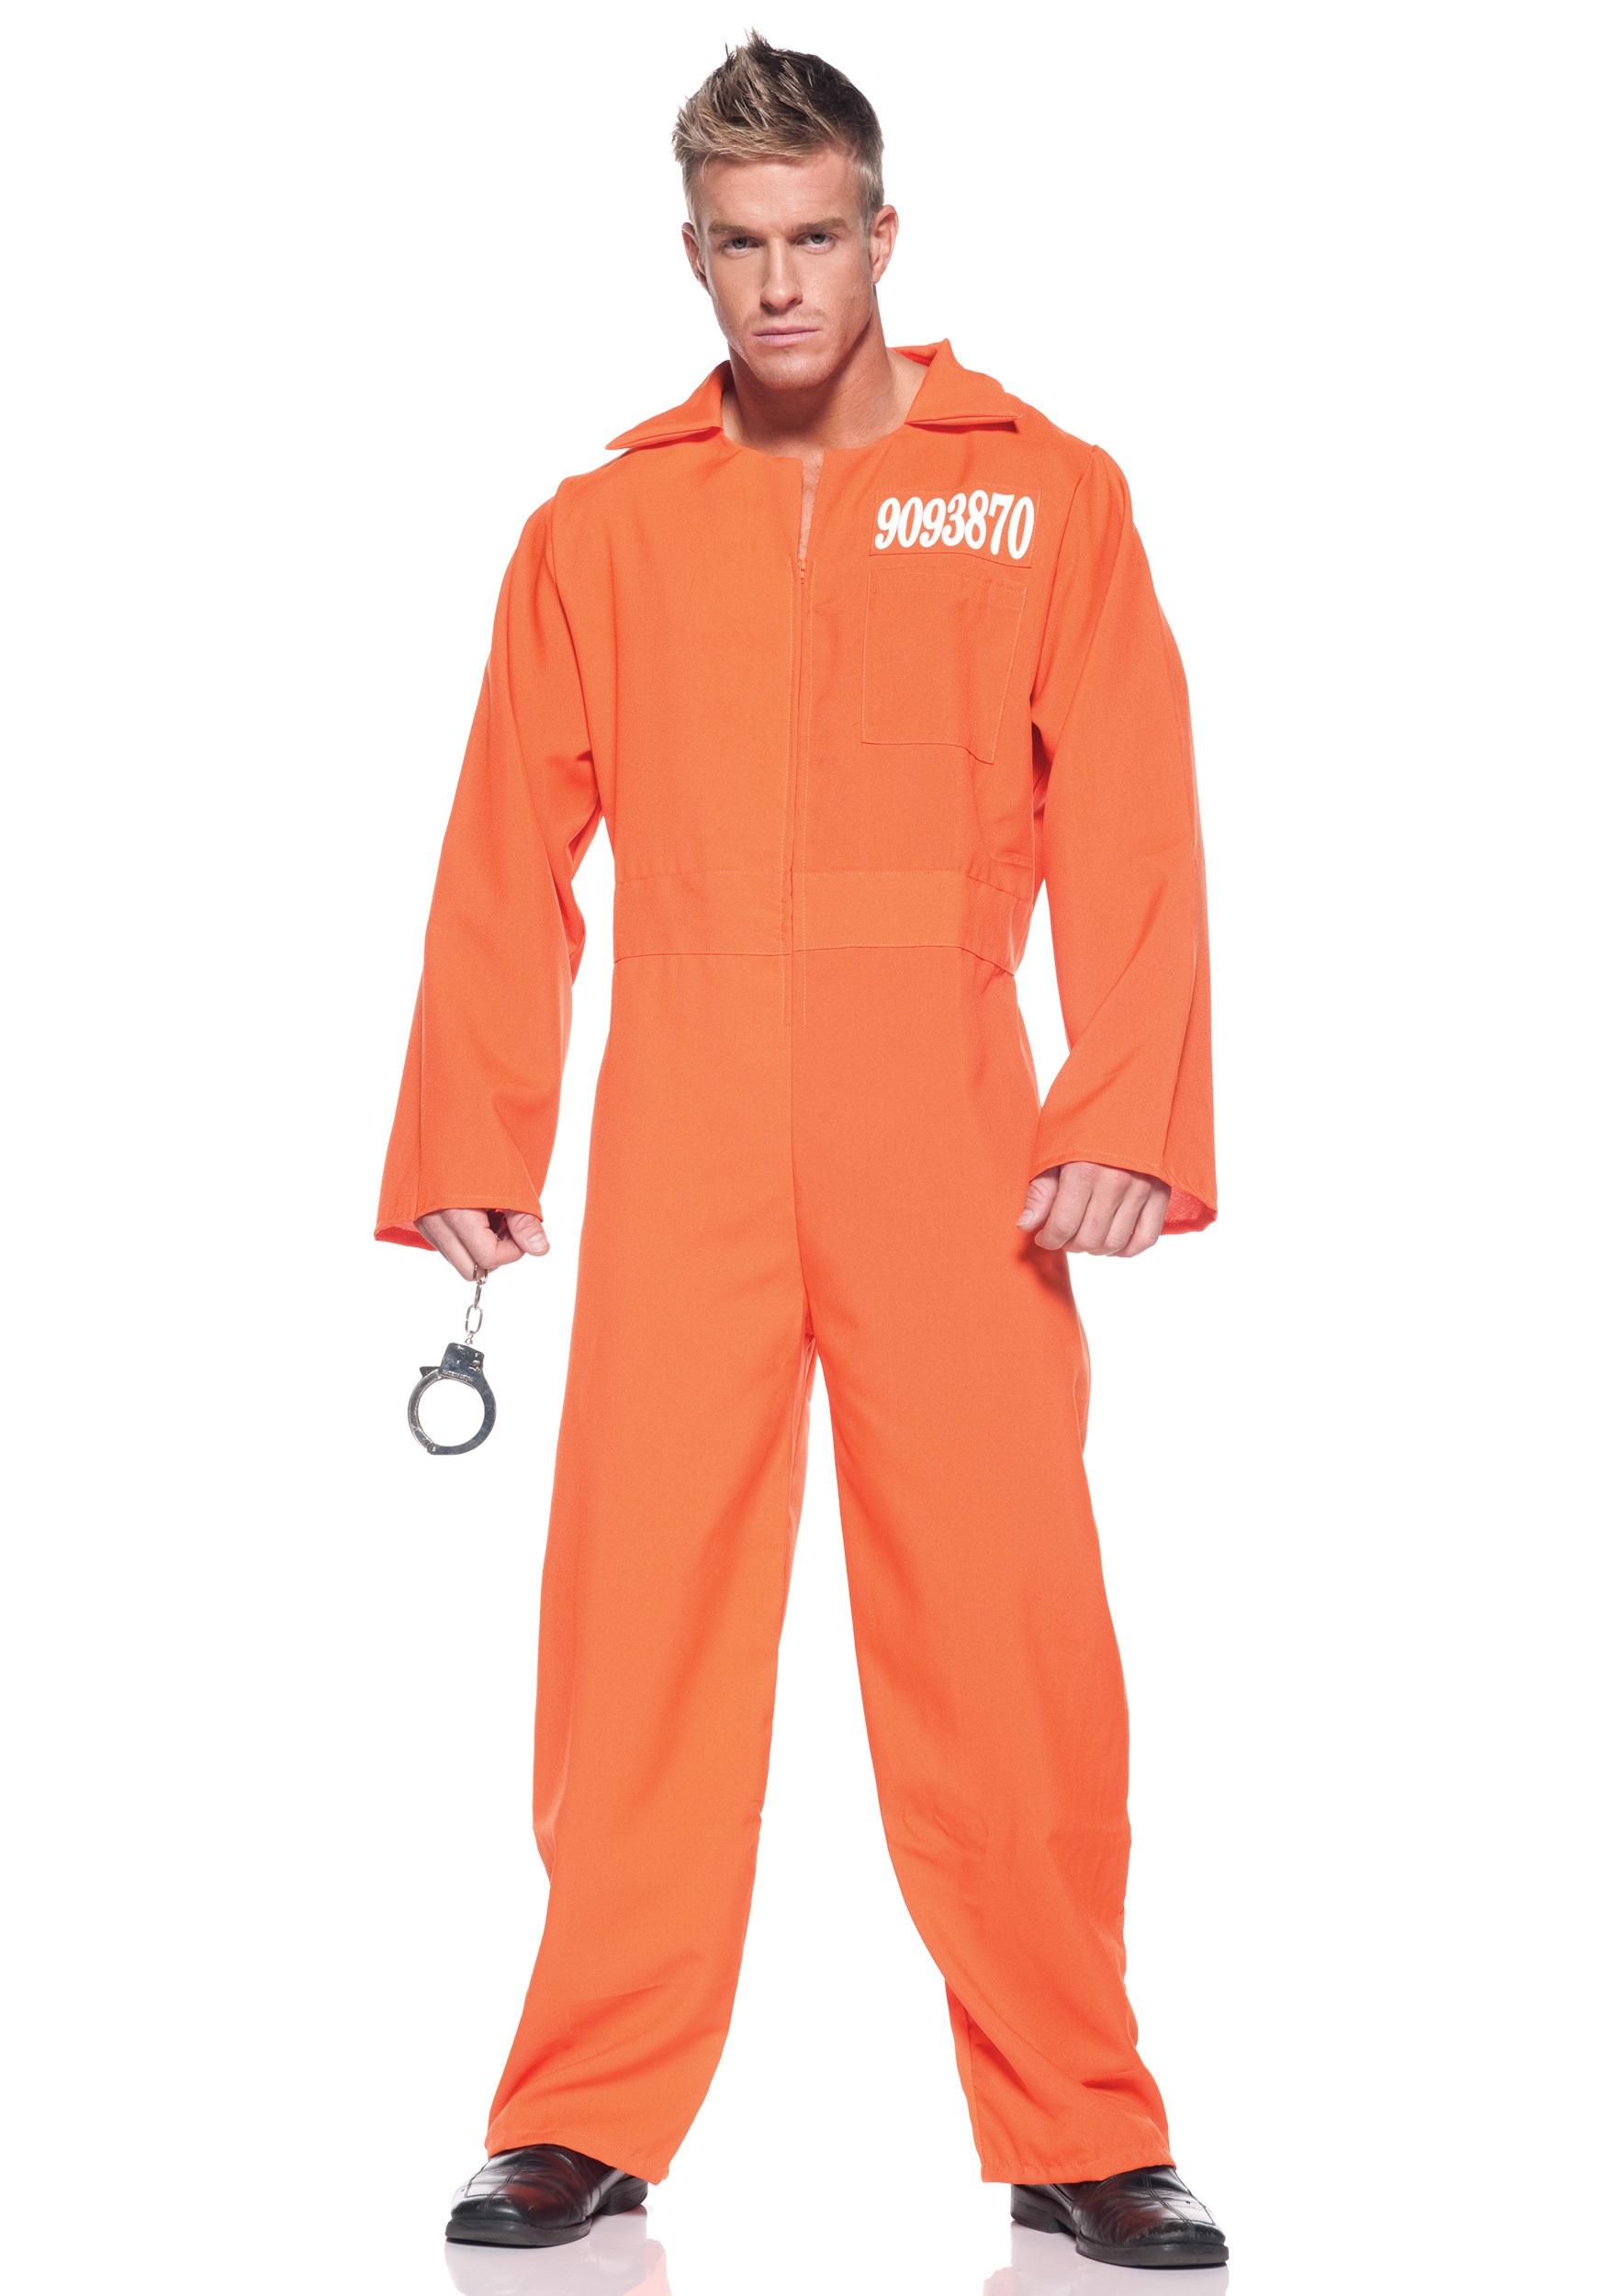 Prison jumpsuit costume for men mens prison jumpsuit costume solutioingenieria Images